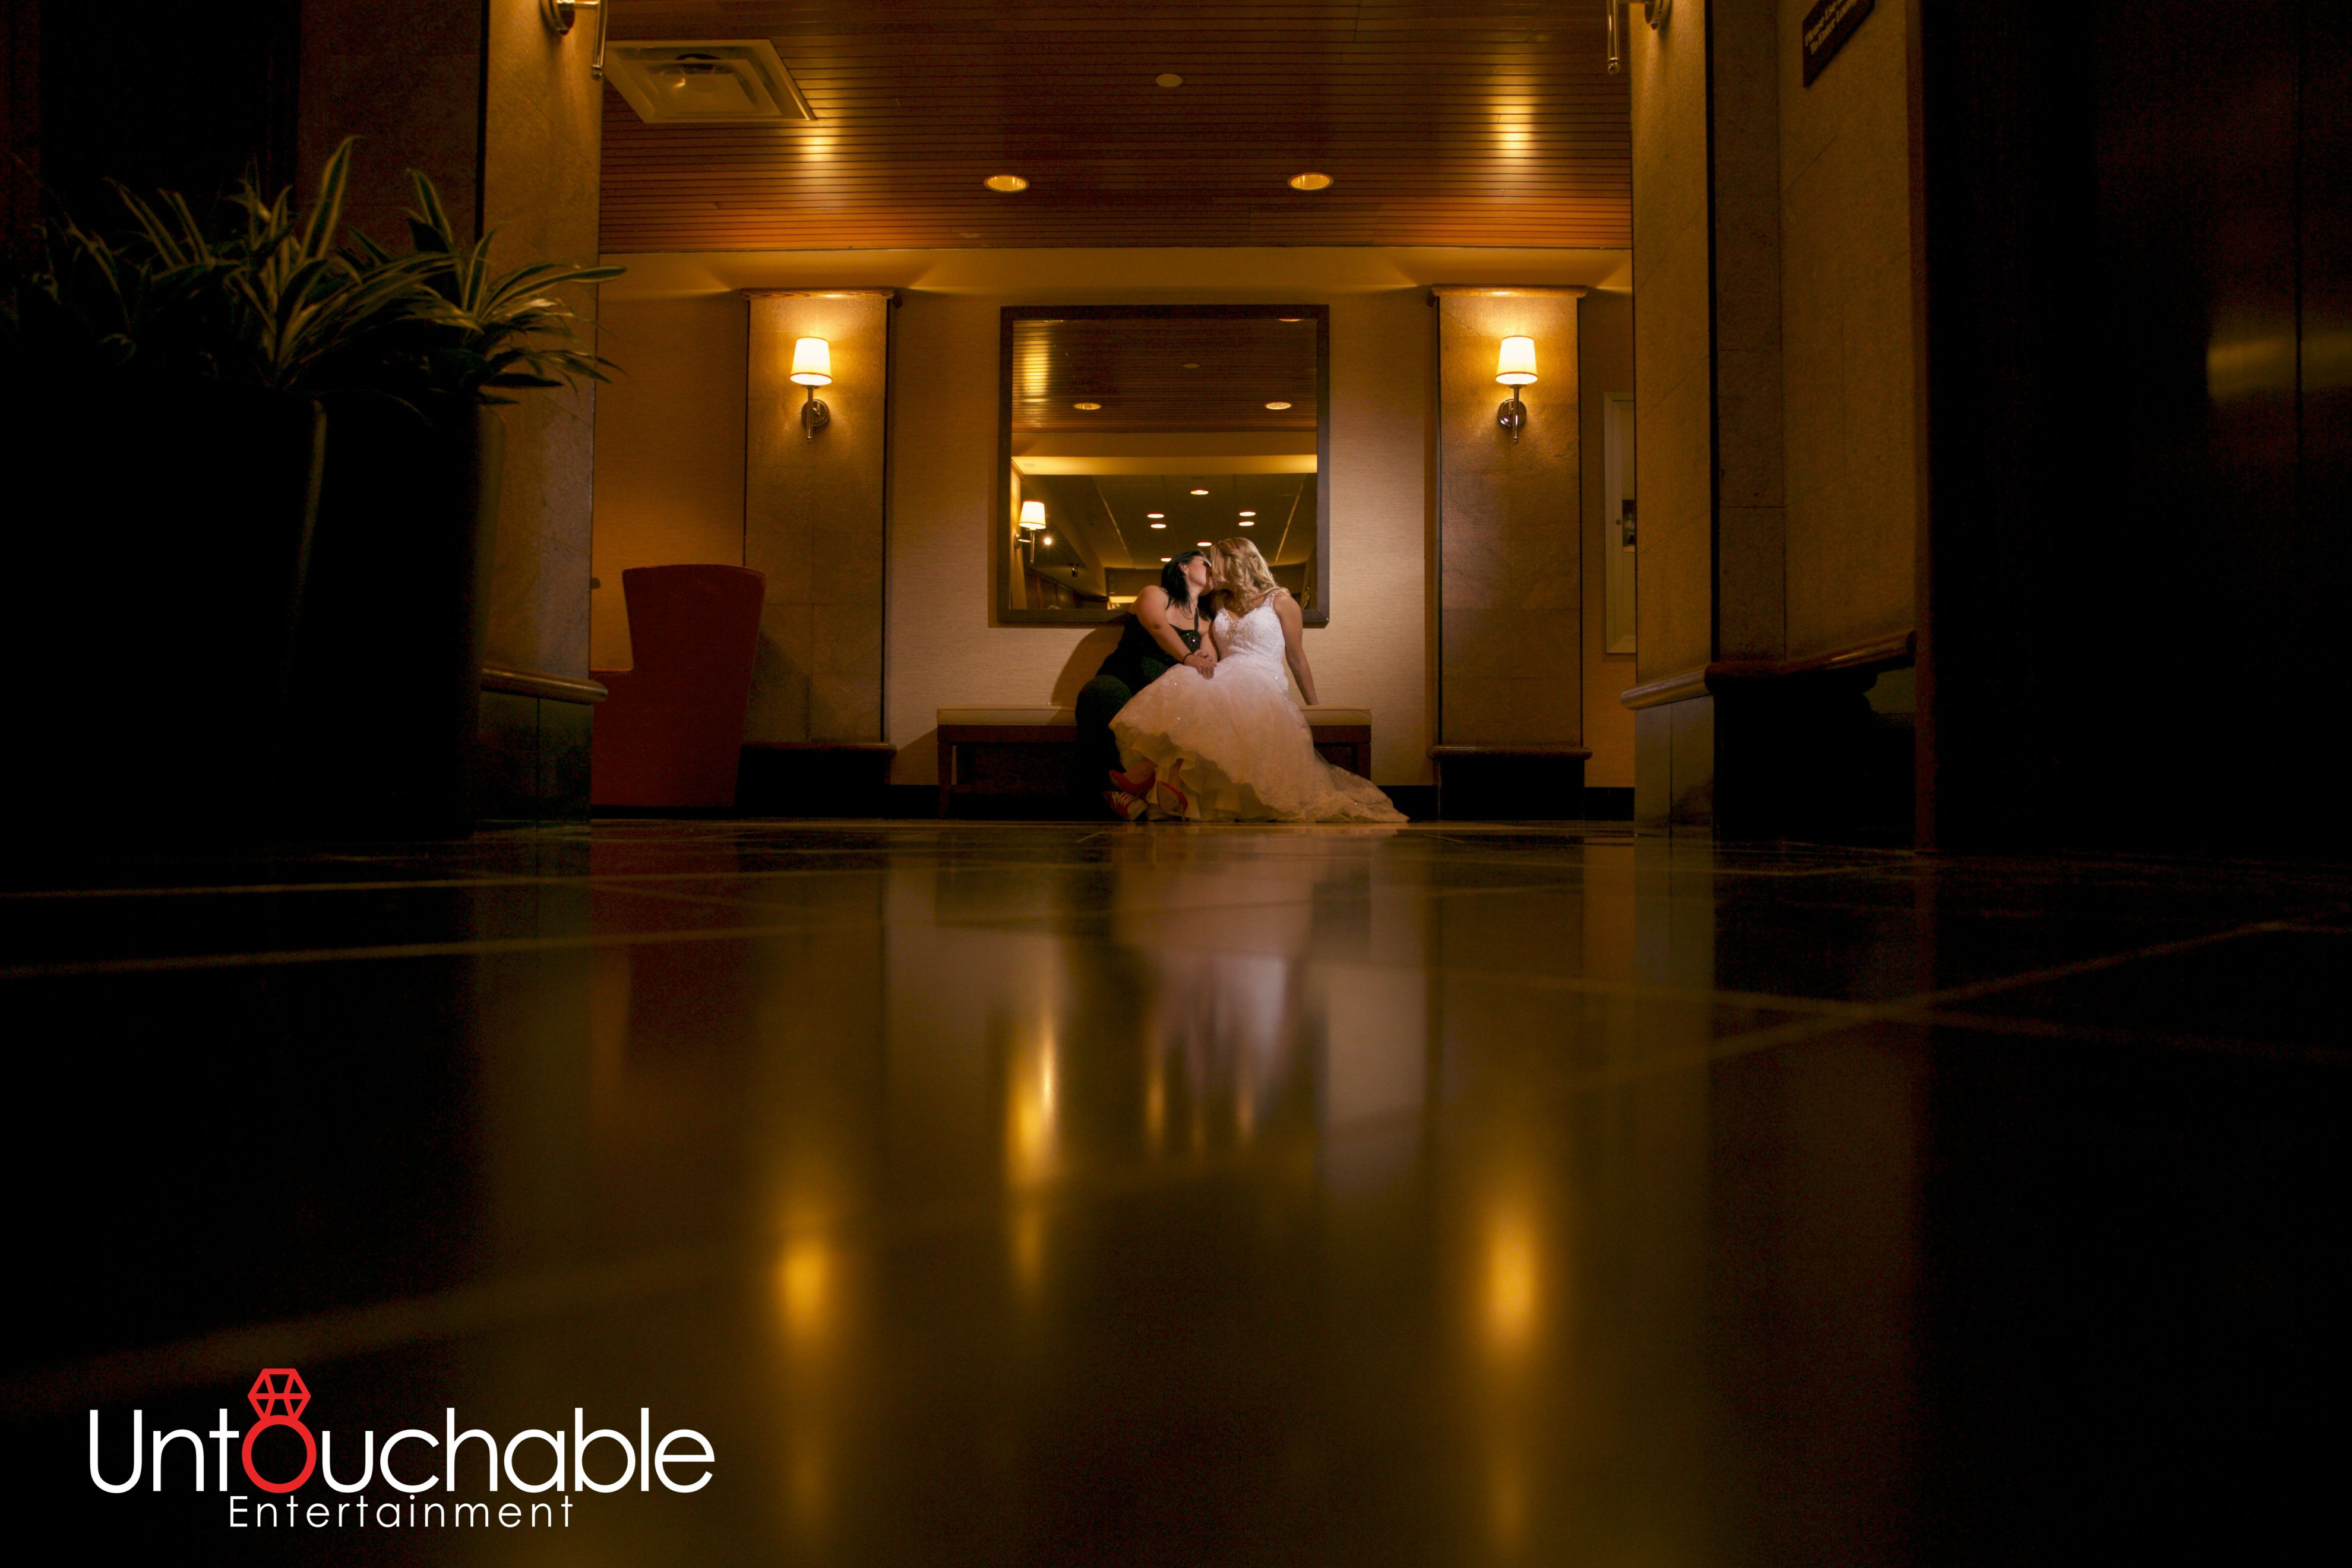 Pin by untouchable photo video dj on indoor wedding portrait ideas